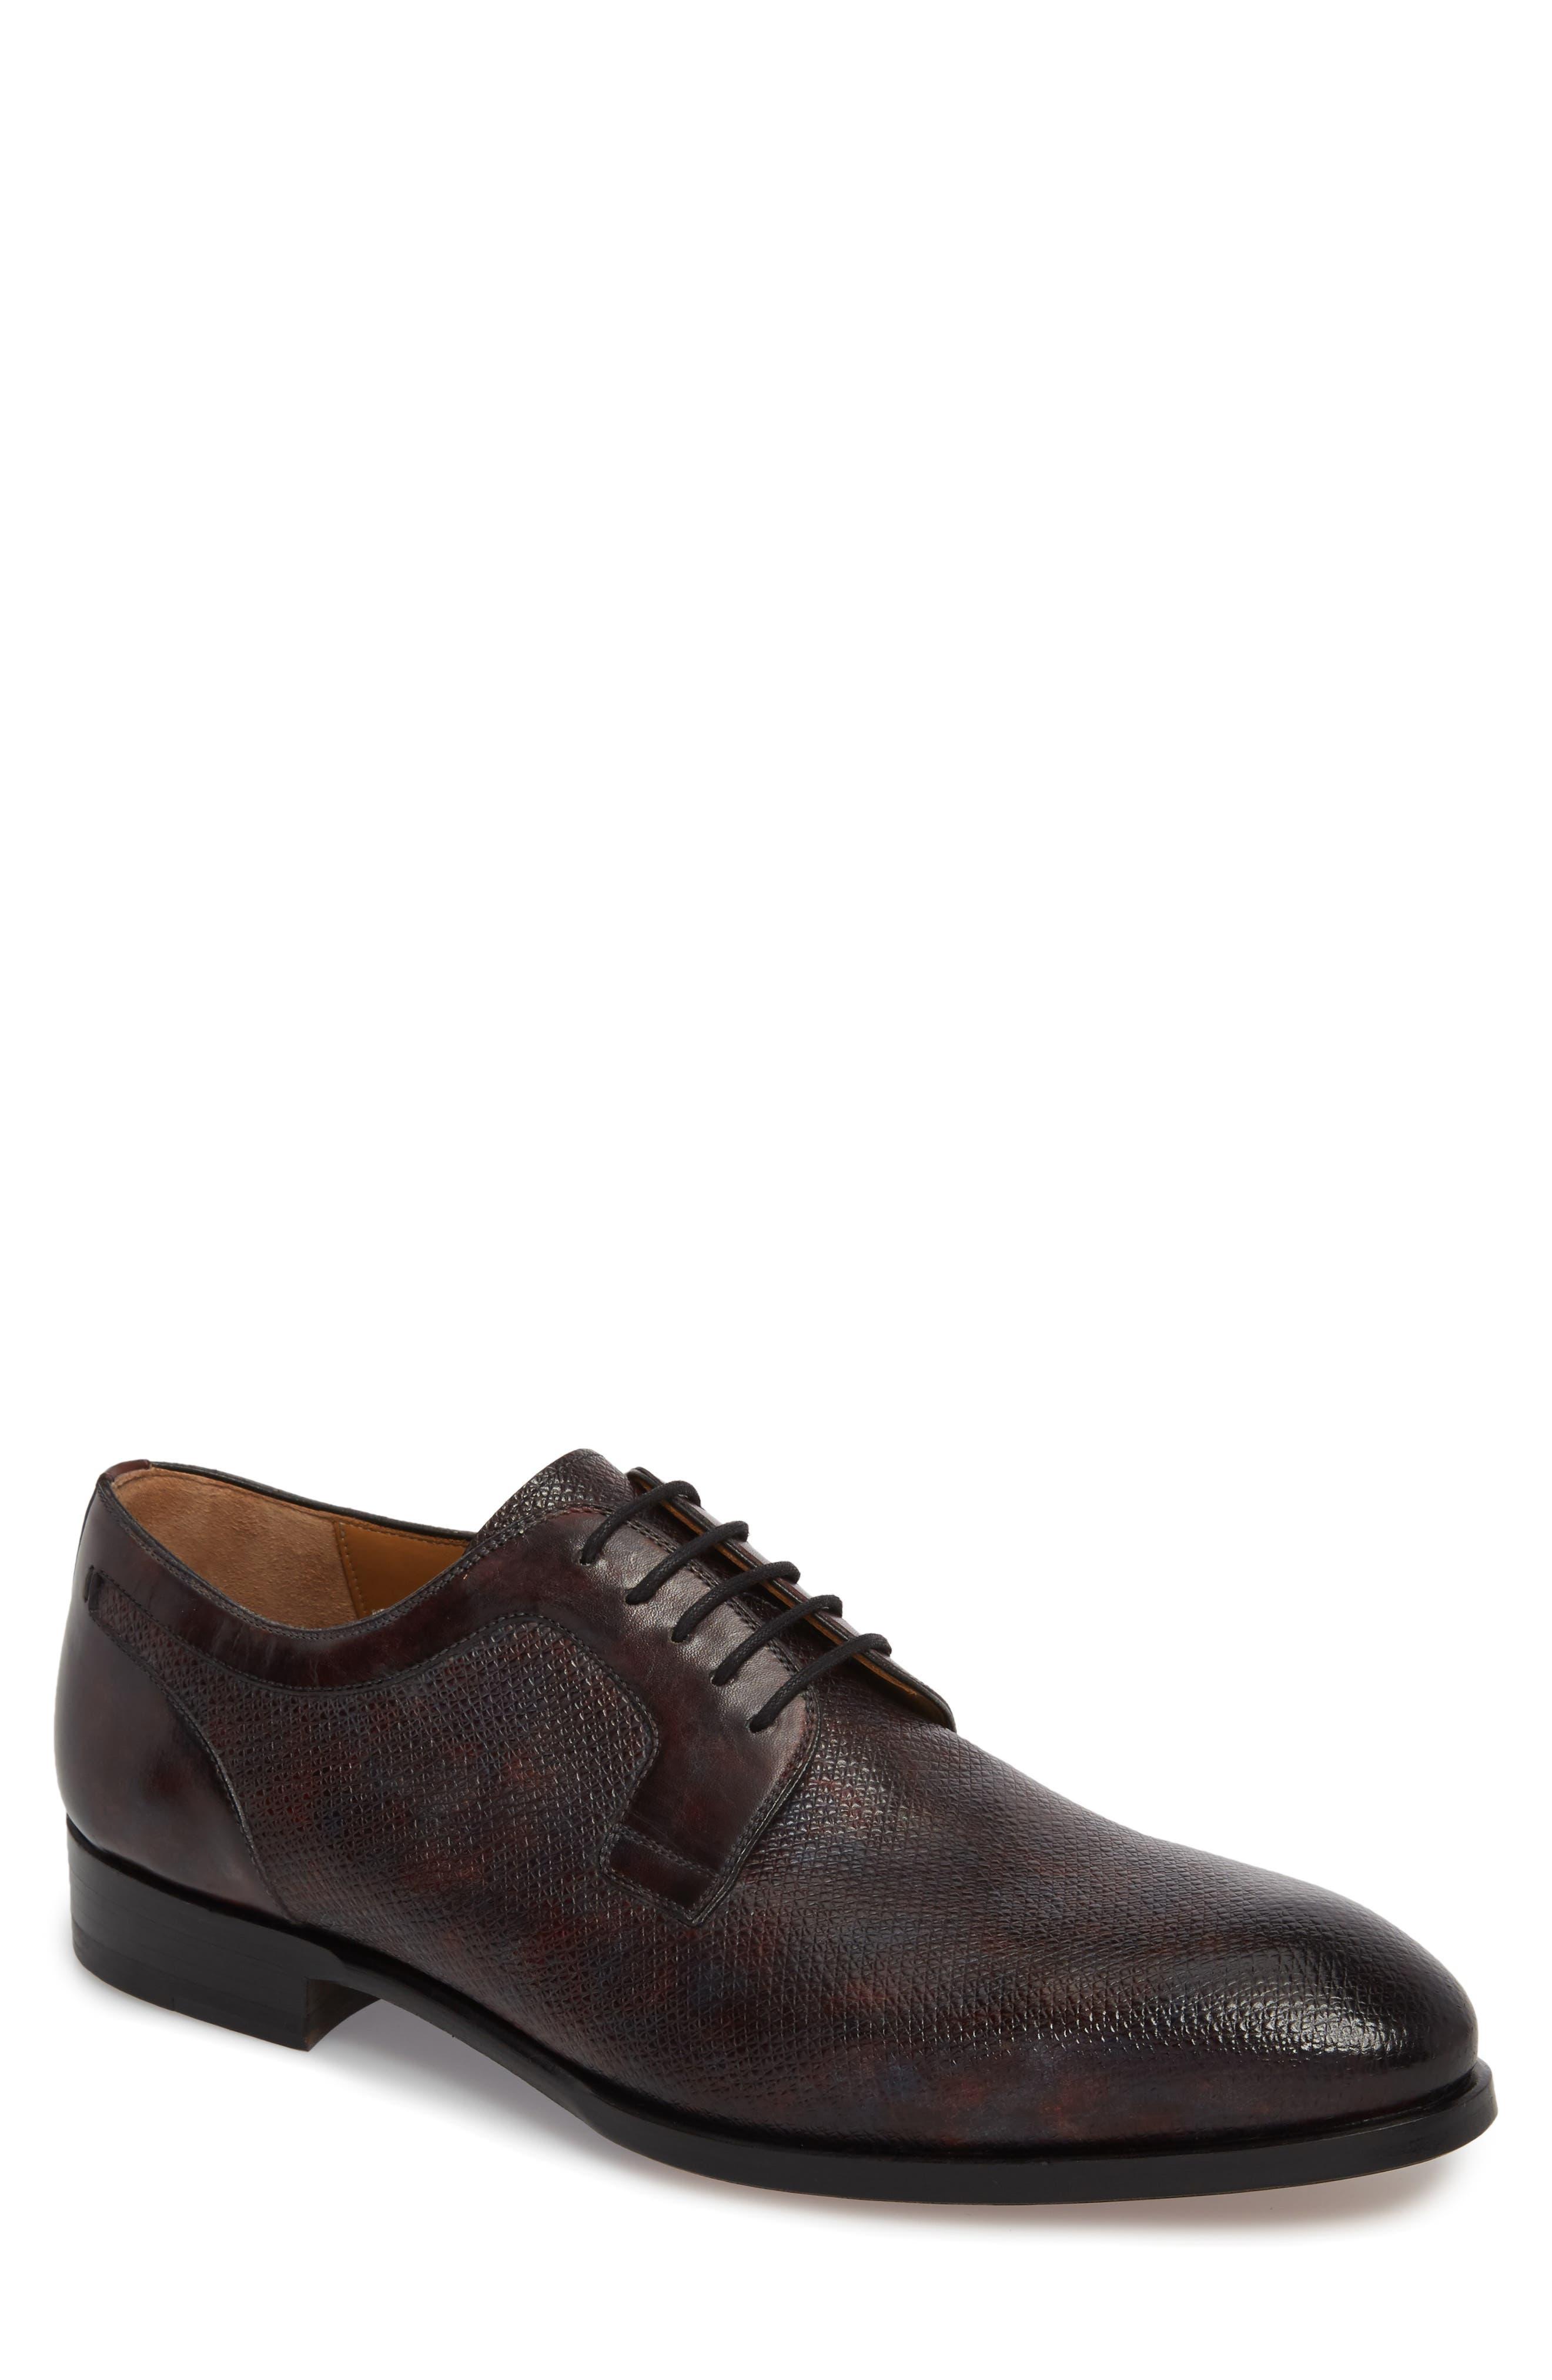 Magnanni Porter Textured Plain Toe Derby (Men)